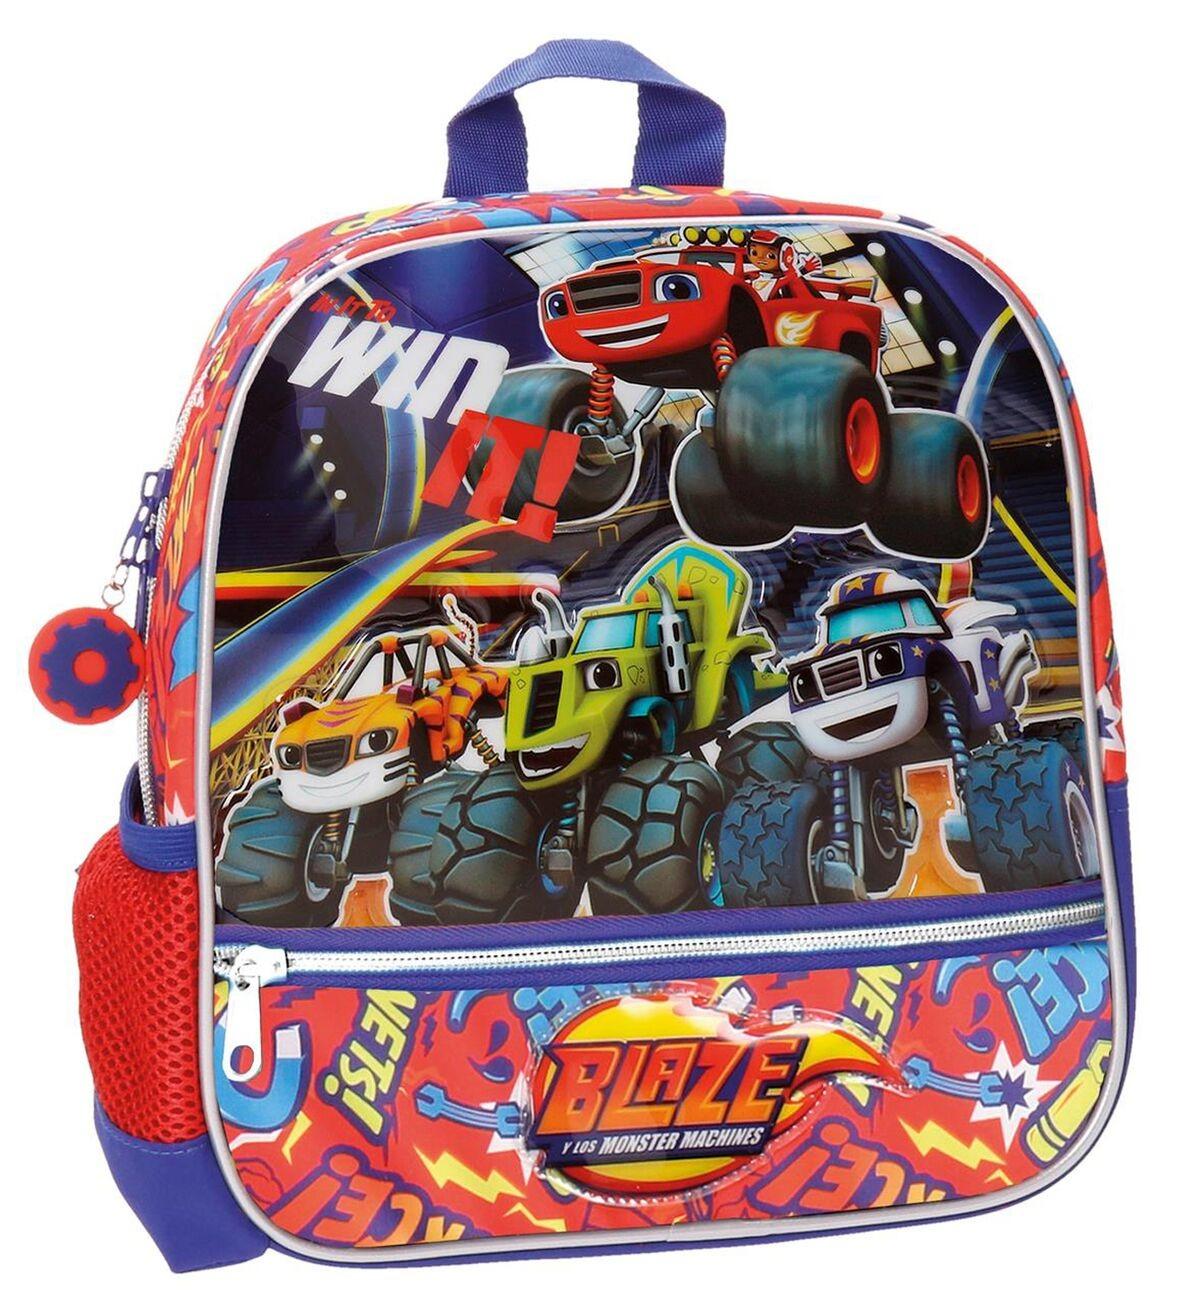 Backpack preschool adaptable to cart blase win